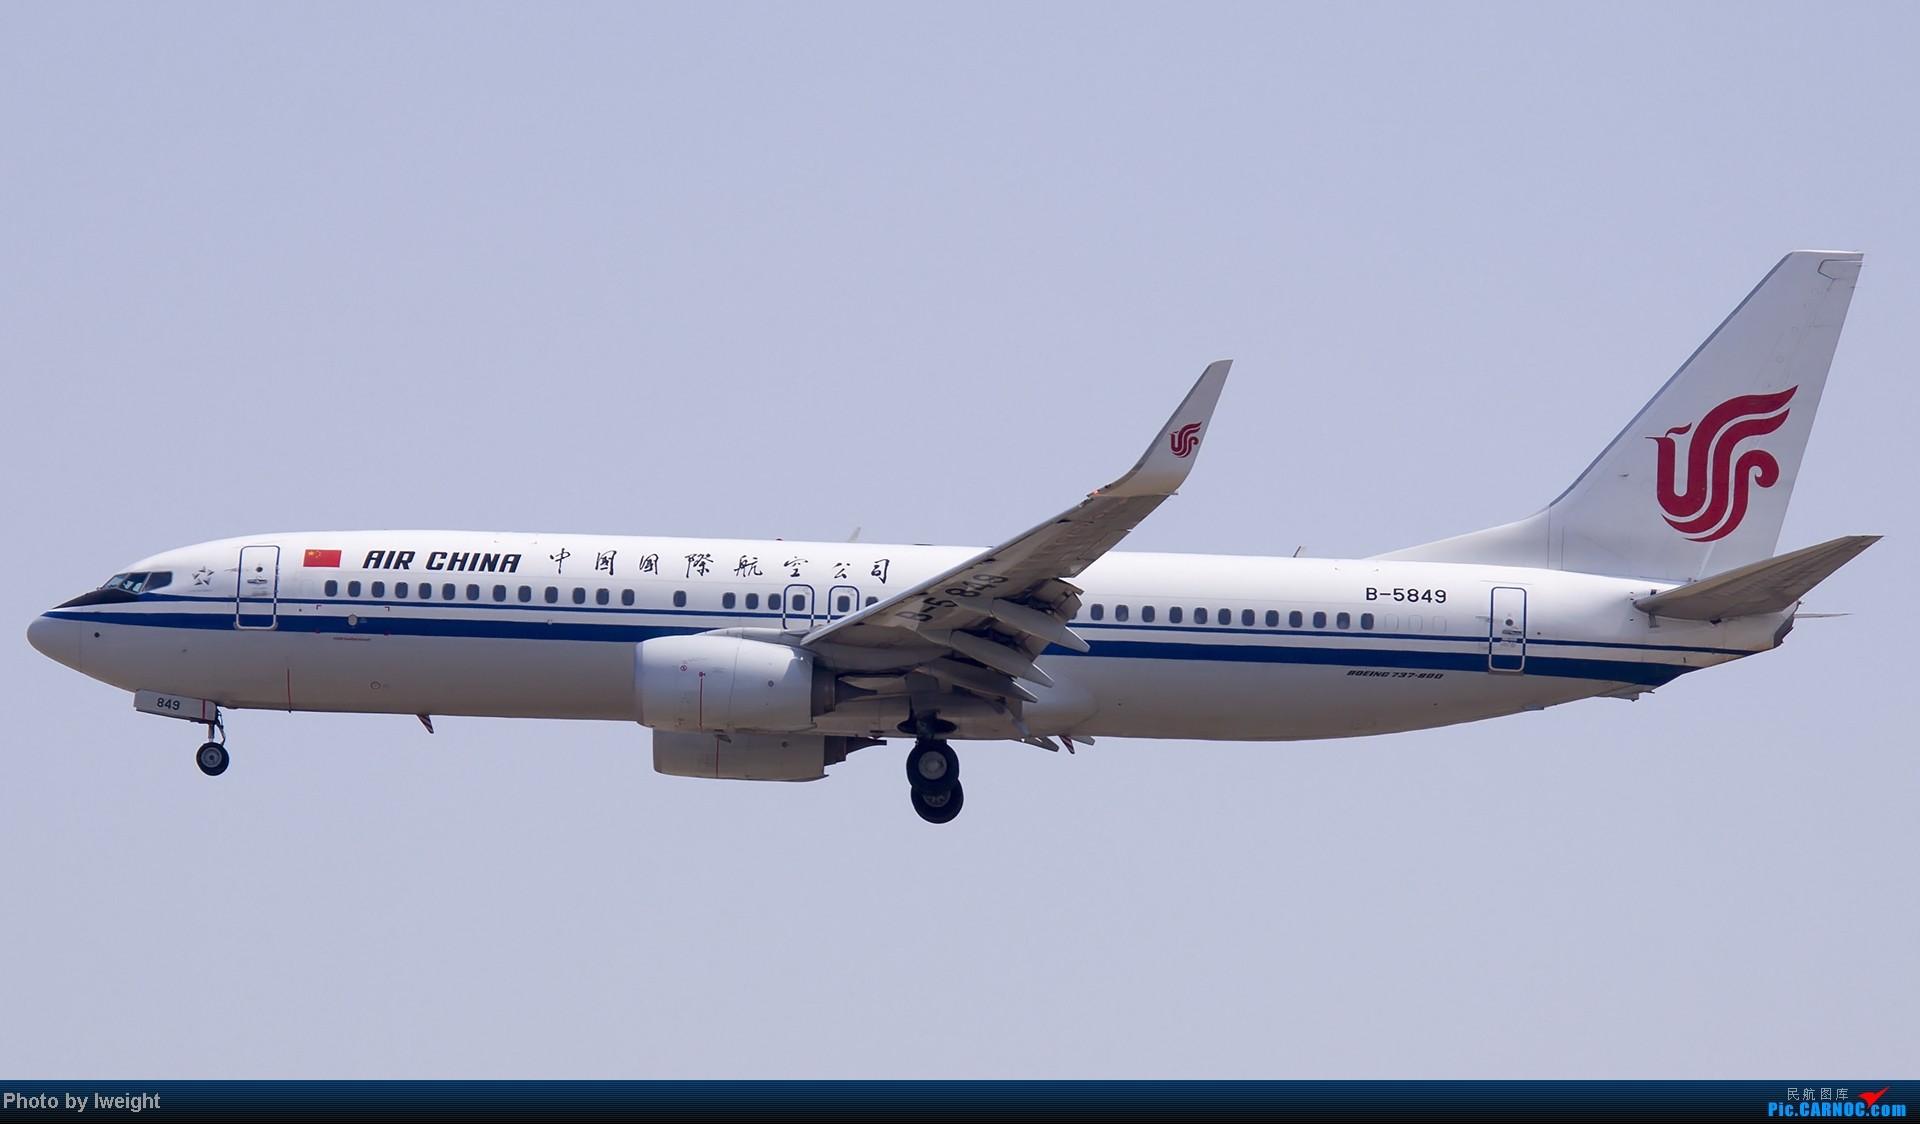 Re:[原创]错过了卡航的巴塞罗那号,只有这些大路货了,泪奔啊 BOEING 737-800 B-5849 中国北京首都机场